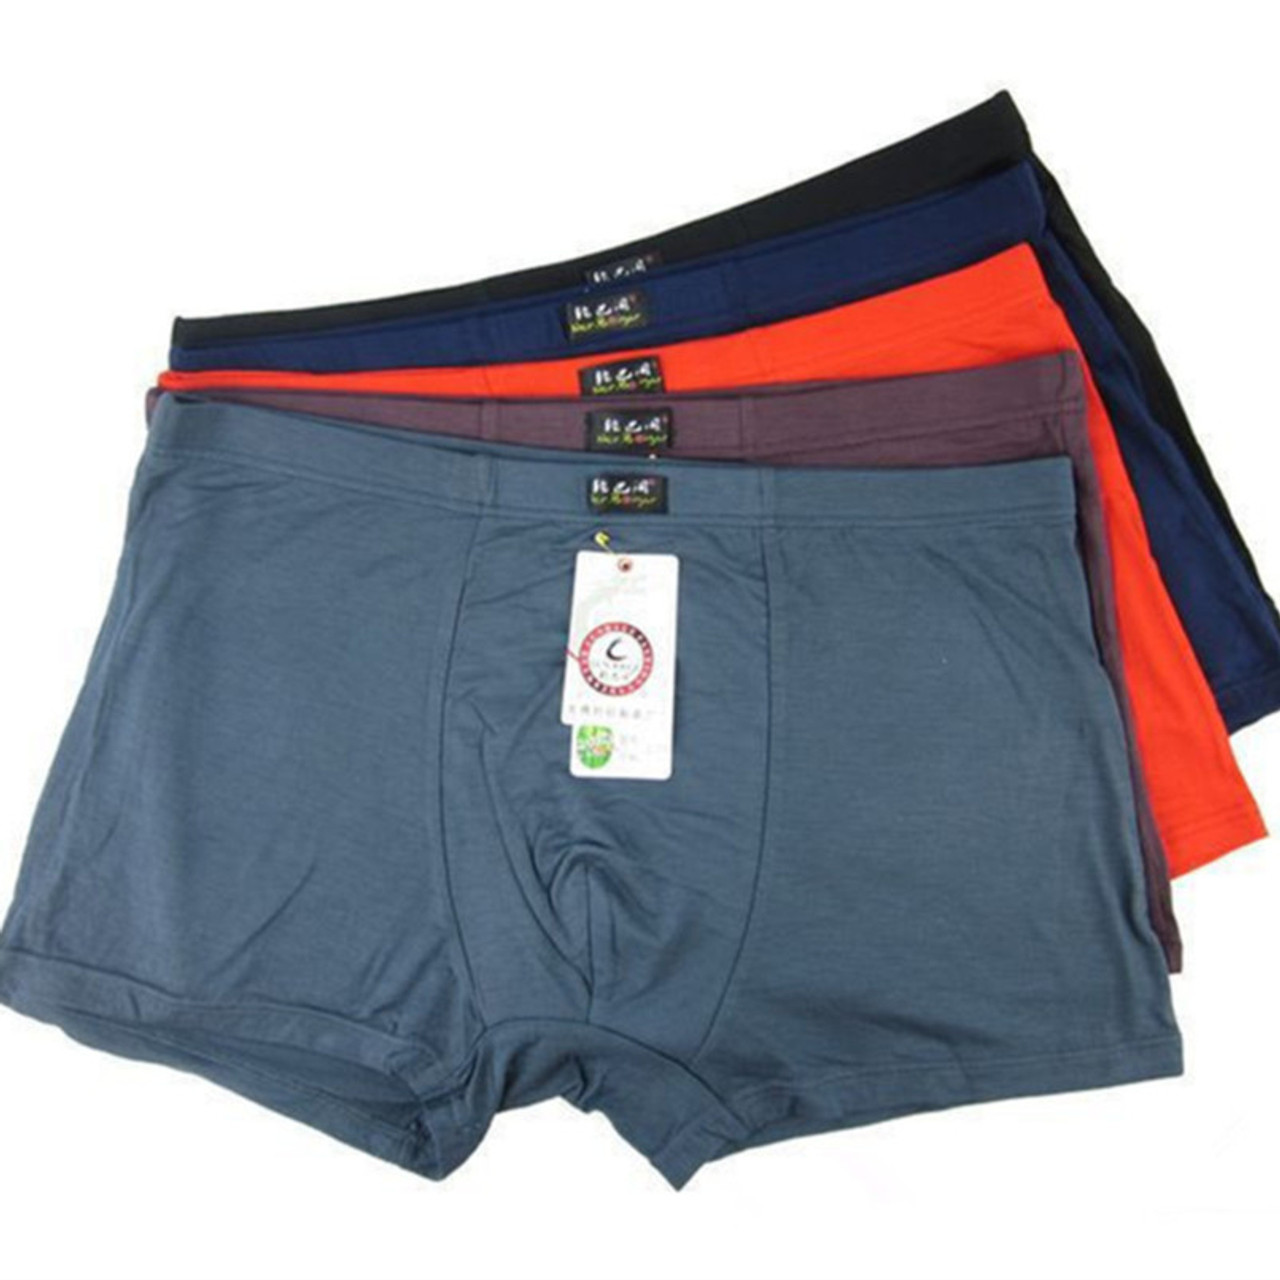 c443974858a5 5PCS/lot Top Quality Boxers Bamboo Underwear Male Underwear Box Plus Big  Size XL- ...